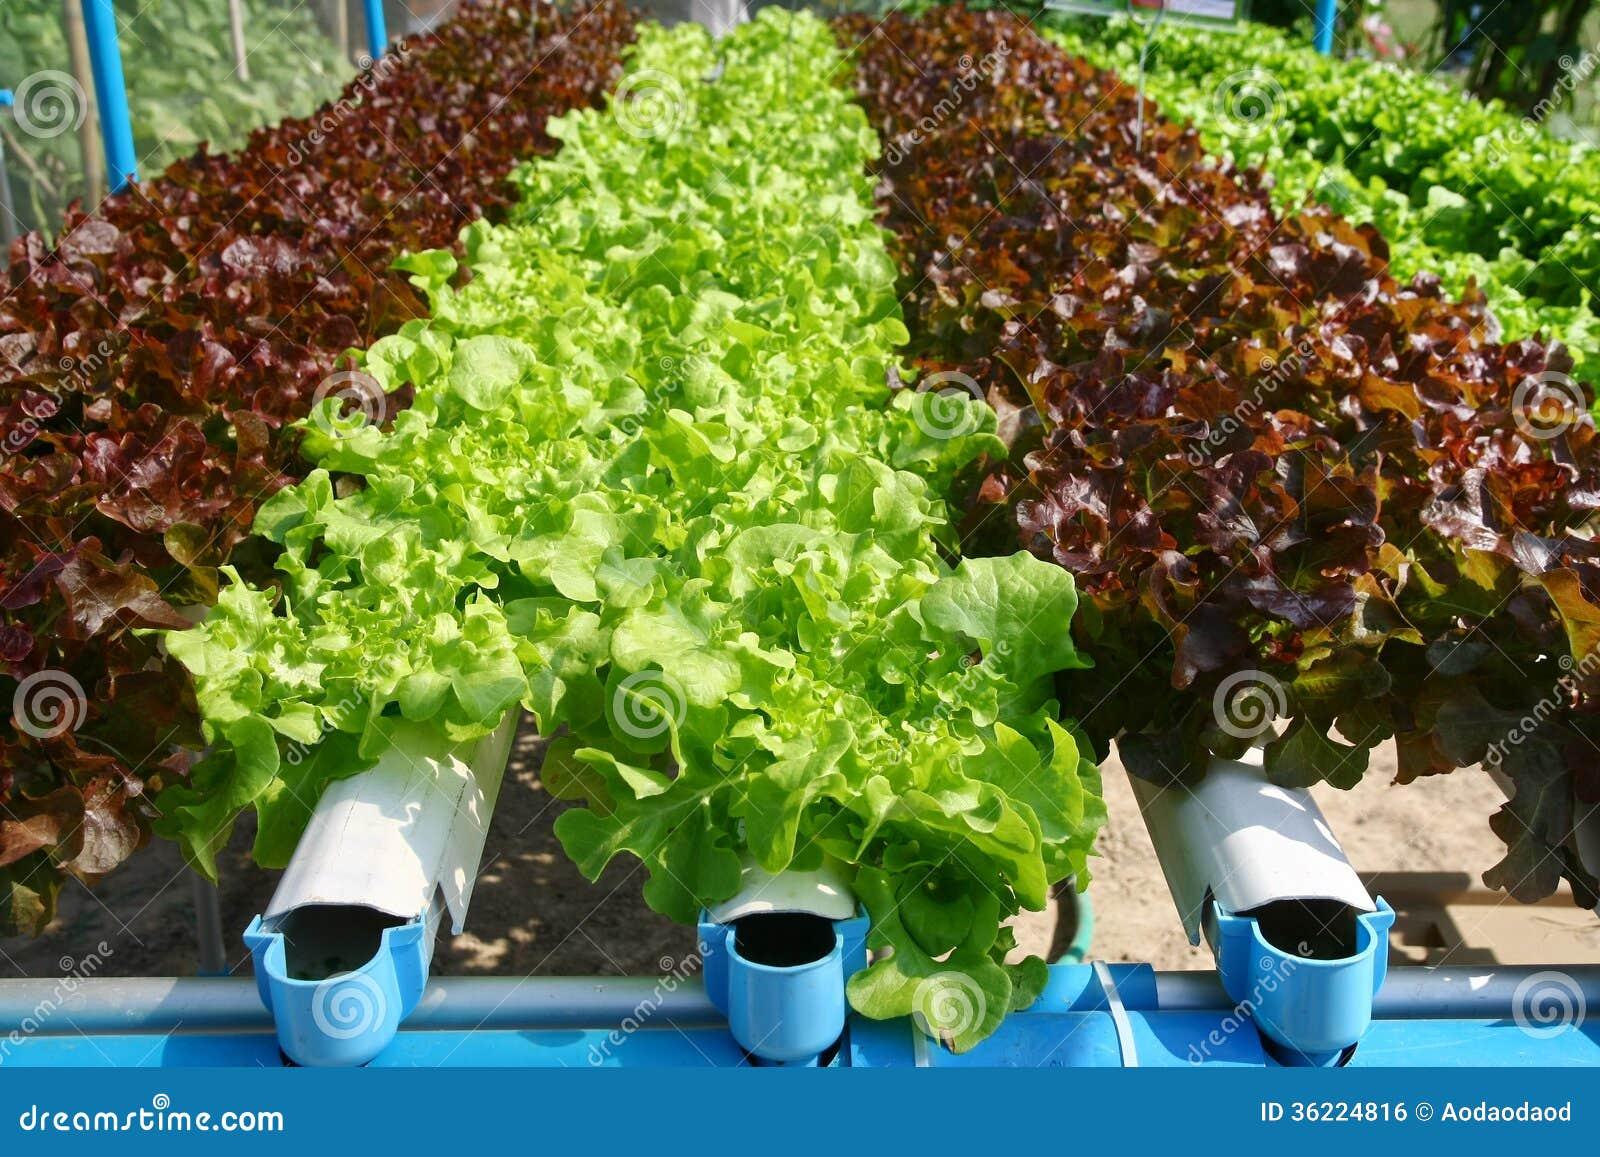 Hydroponics vegetable farming